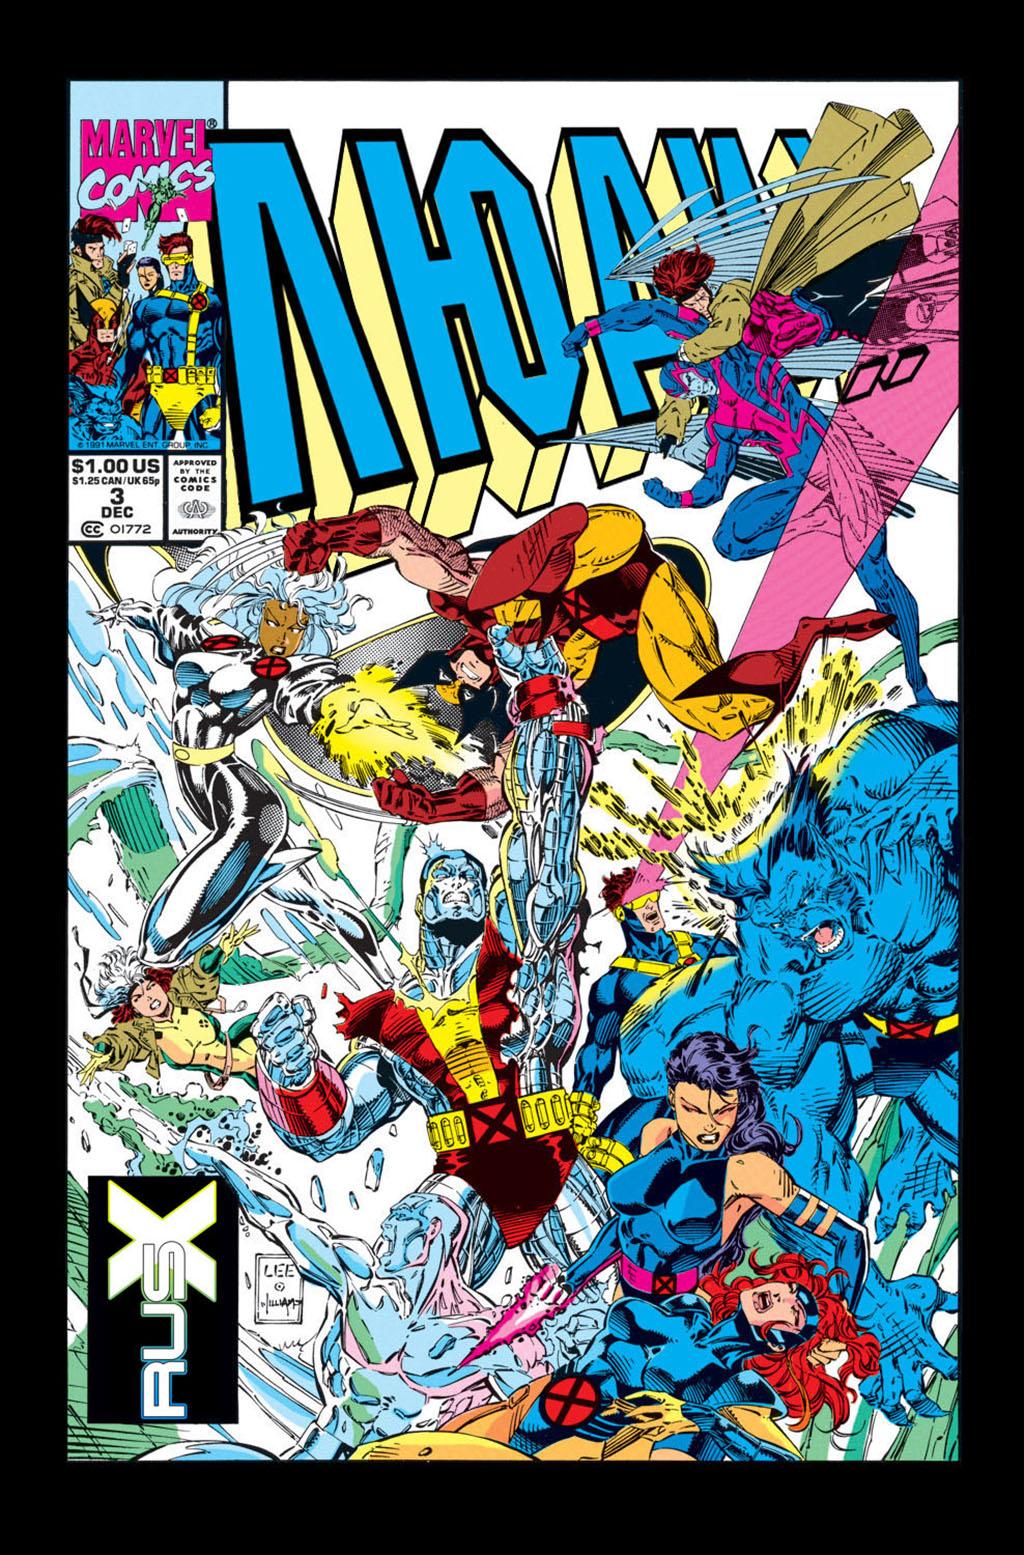 комикс Люди Икс том 2